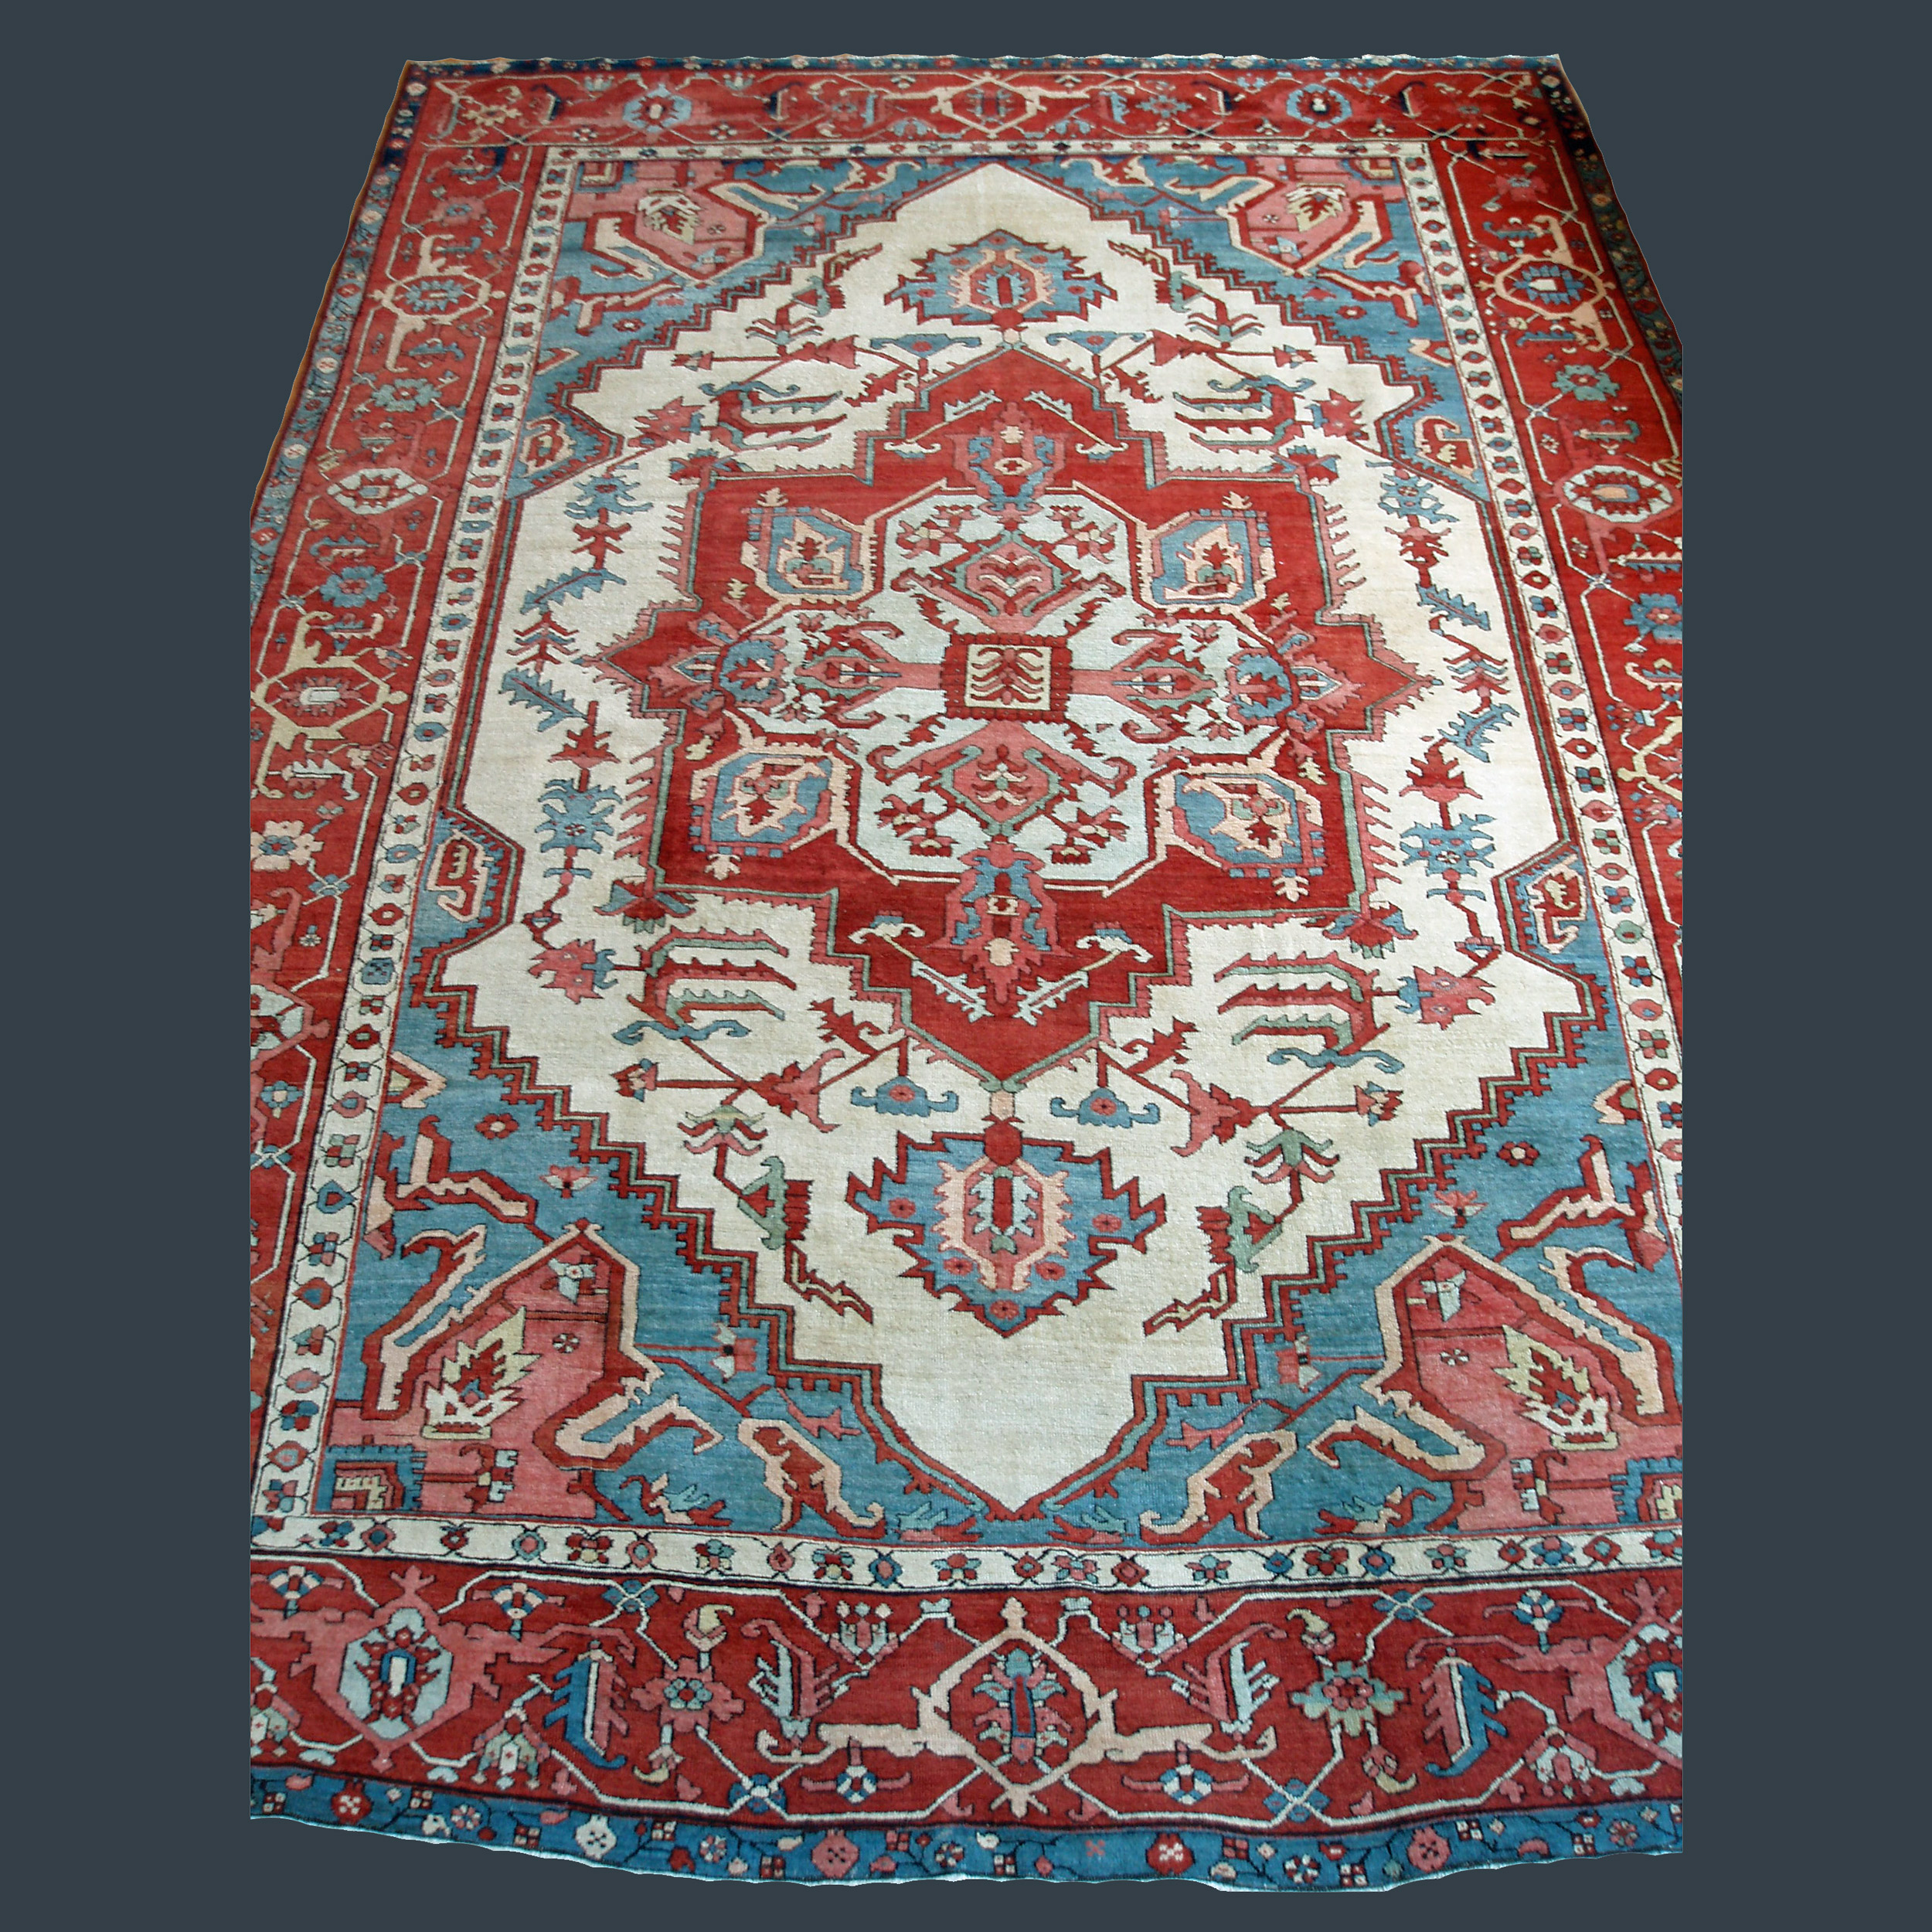 Antique Persian Heriz Serapi carpet with ivory field